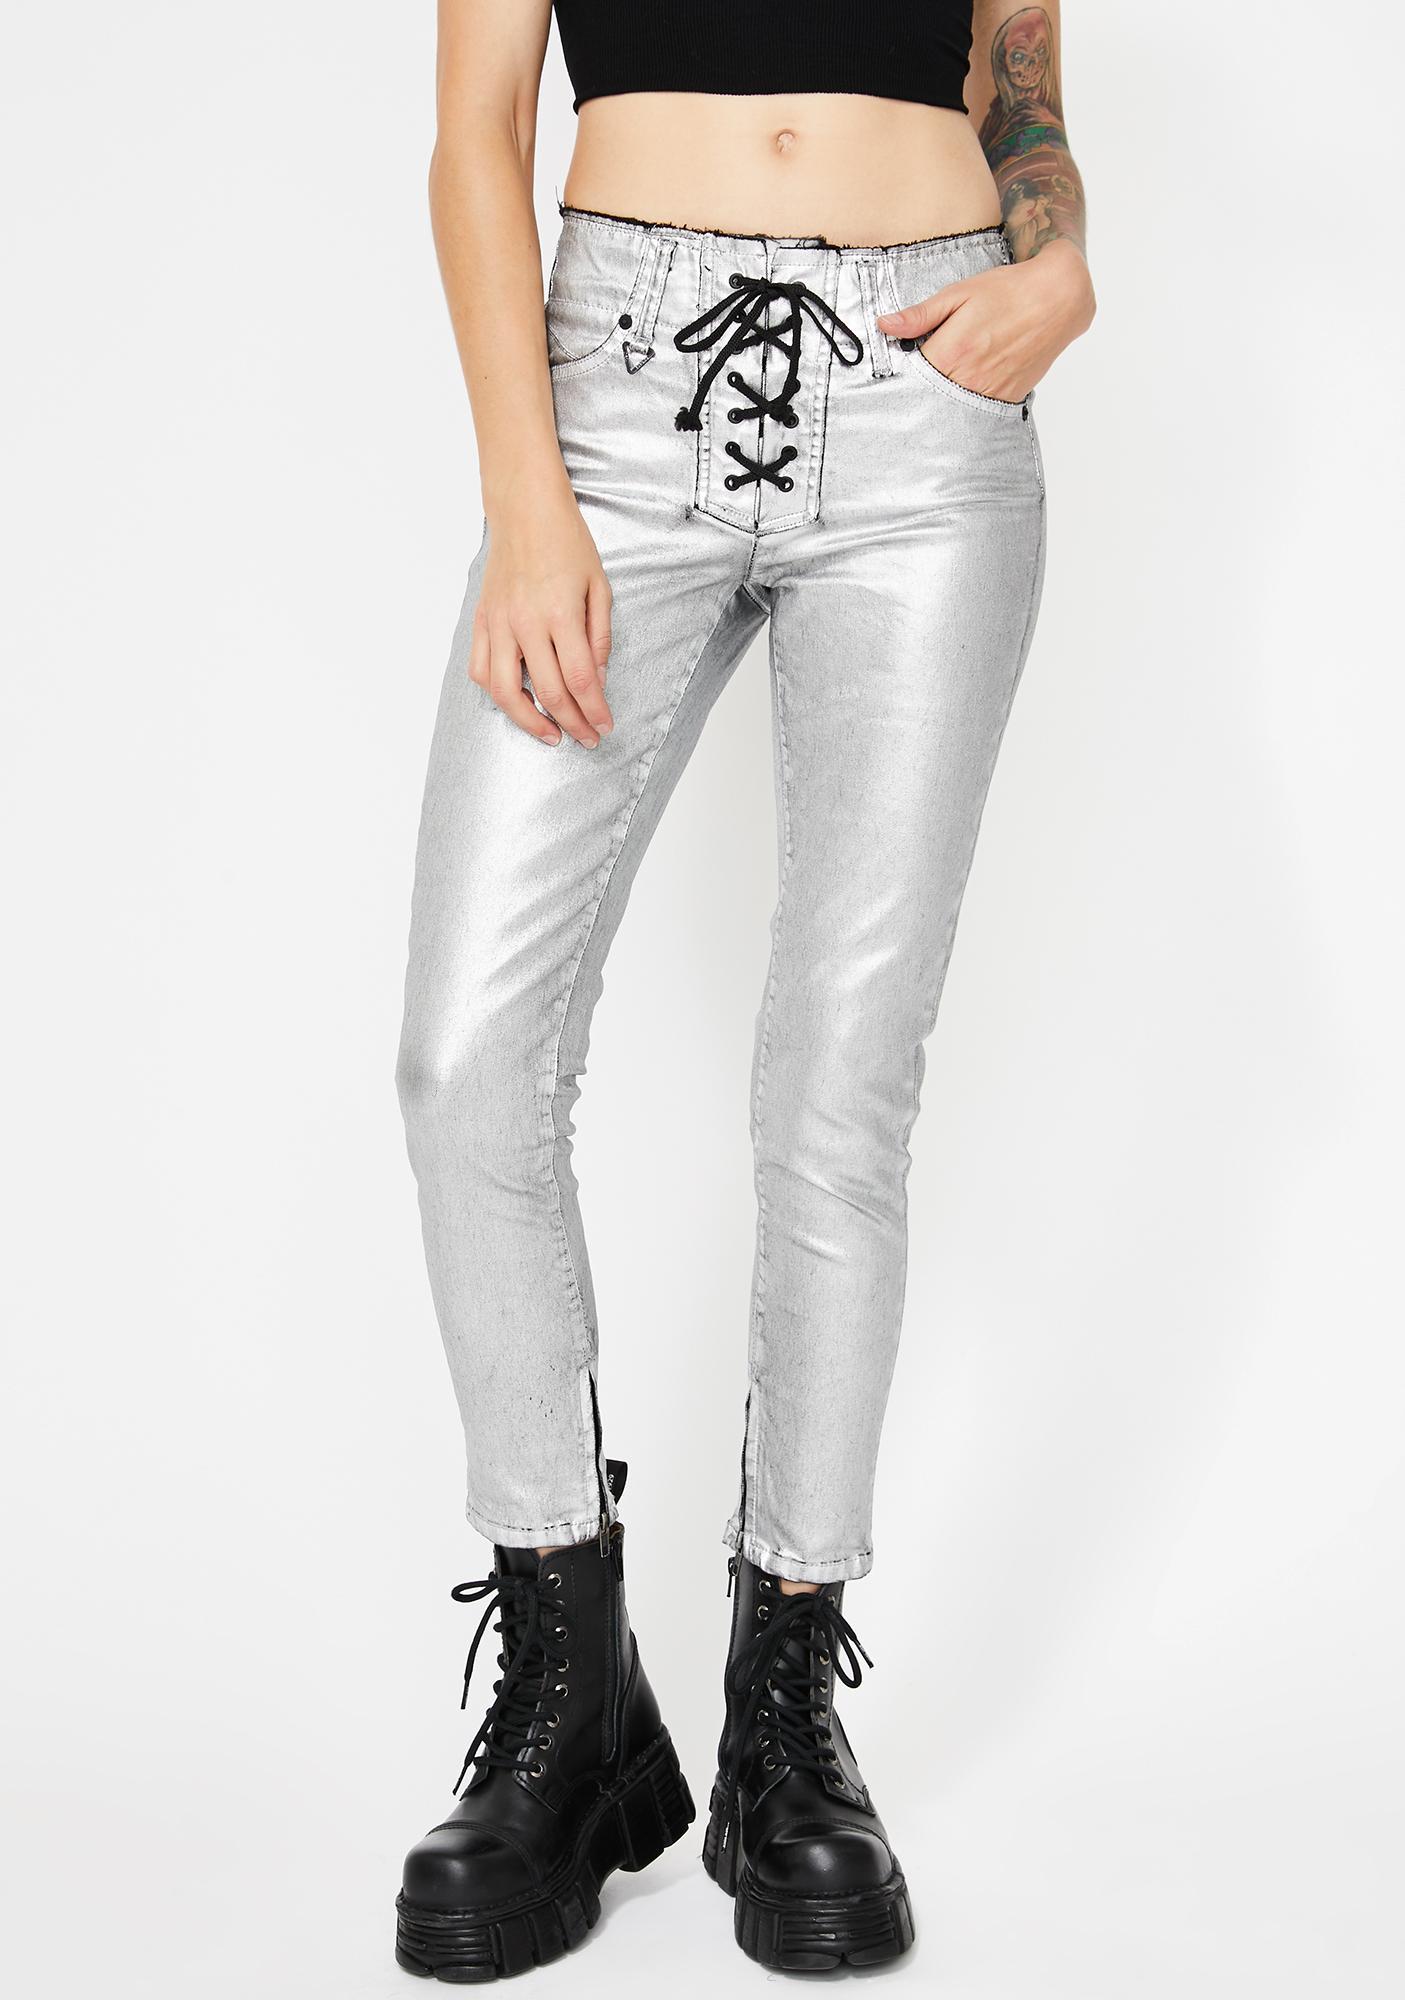 Neon Blonde Blondie Lace Up Pants